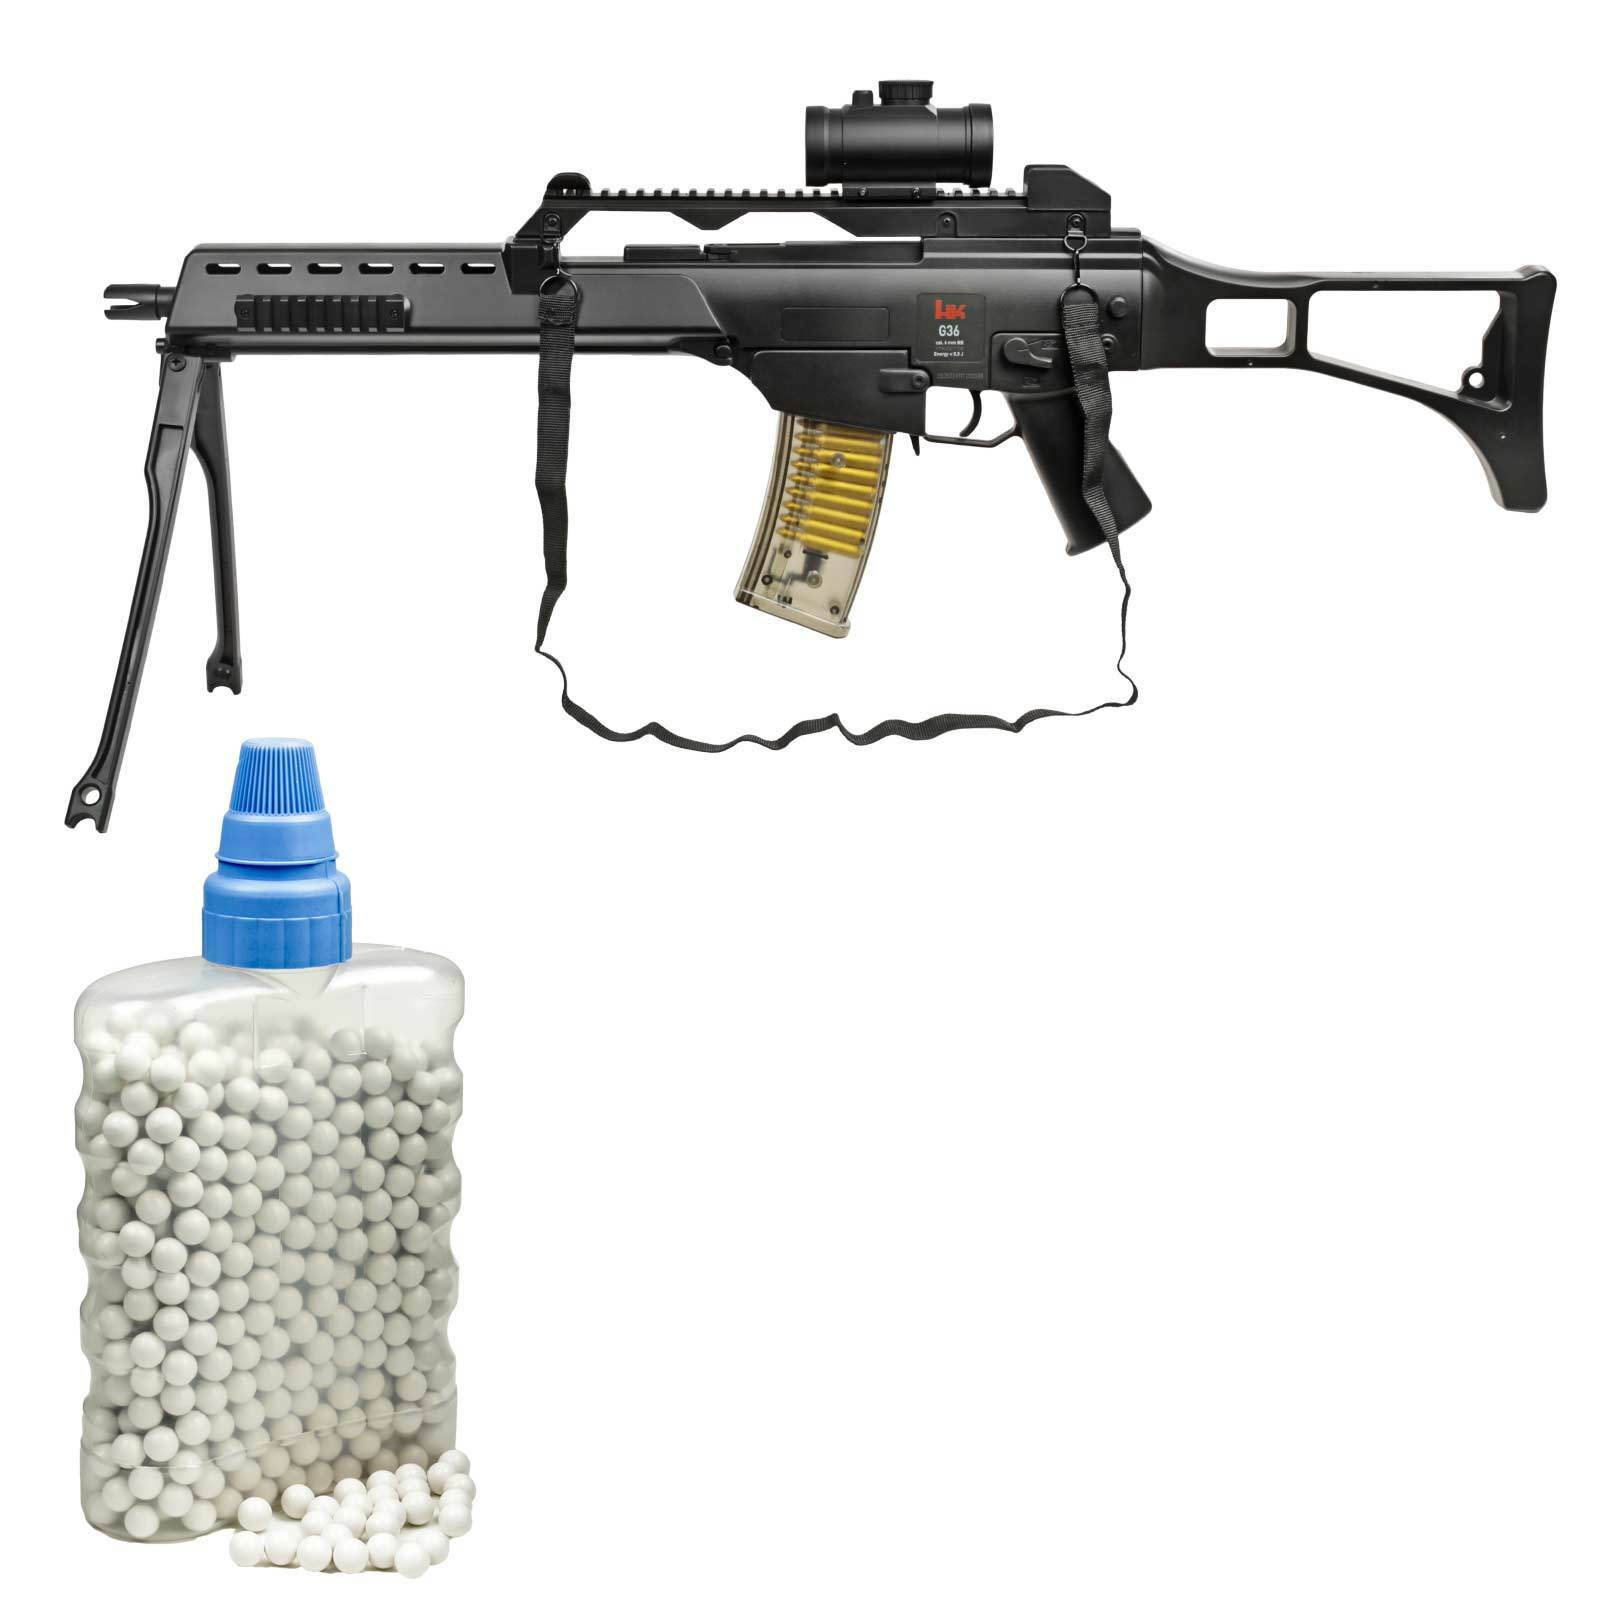 SET Heckler & Koch G36 Sniper Softair-Gewehr 6 mm BB < 0,5 Joule (P14) + 800 BB